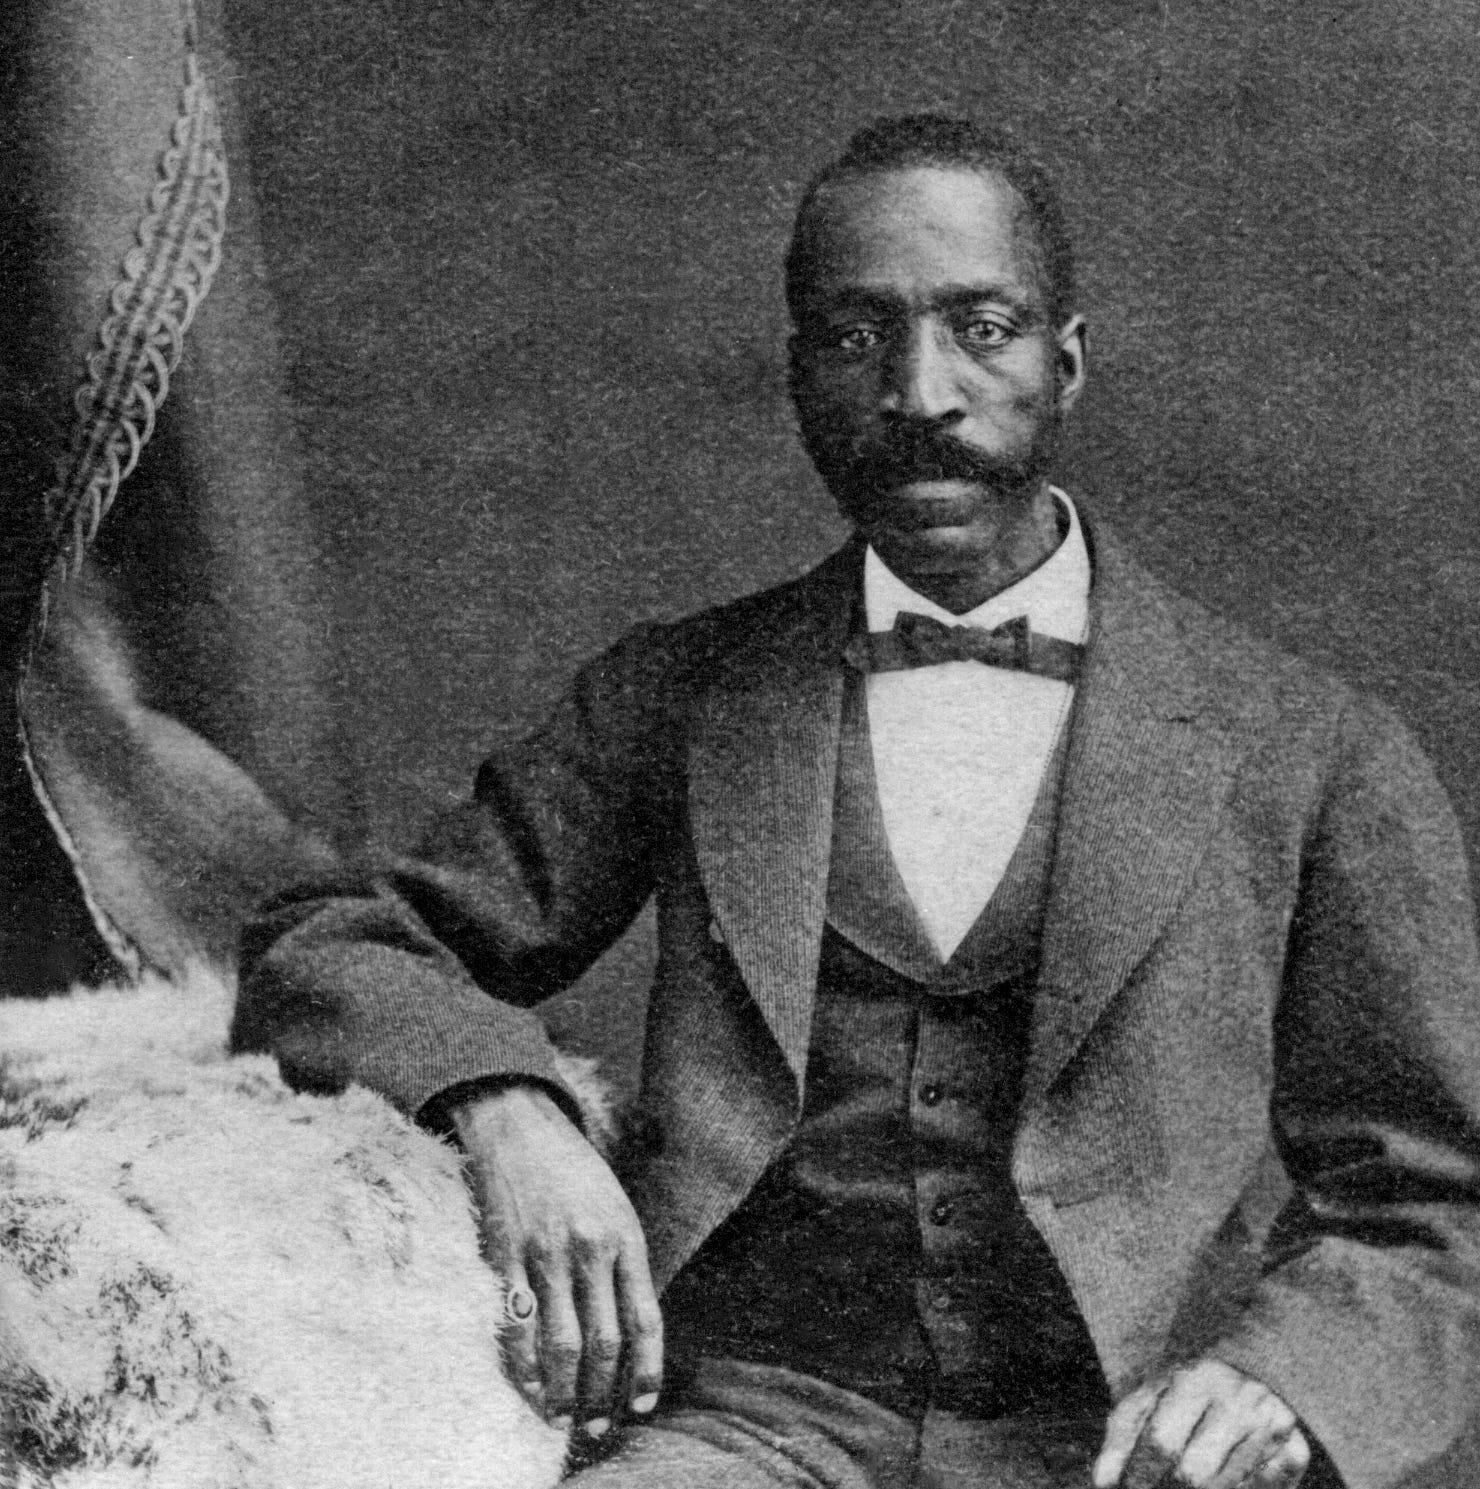 'Oregon's Black Pioneers' documentary features Salem nonprofit, cemetery